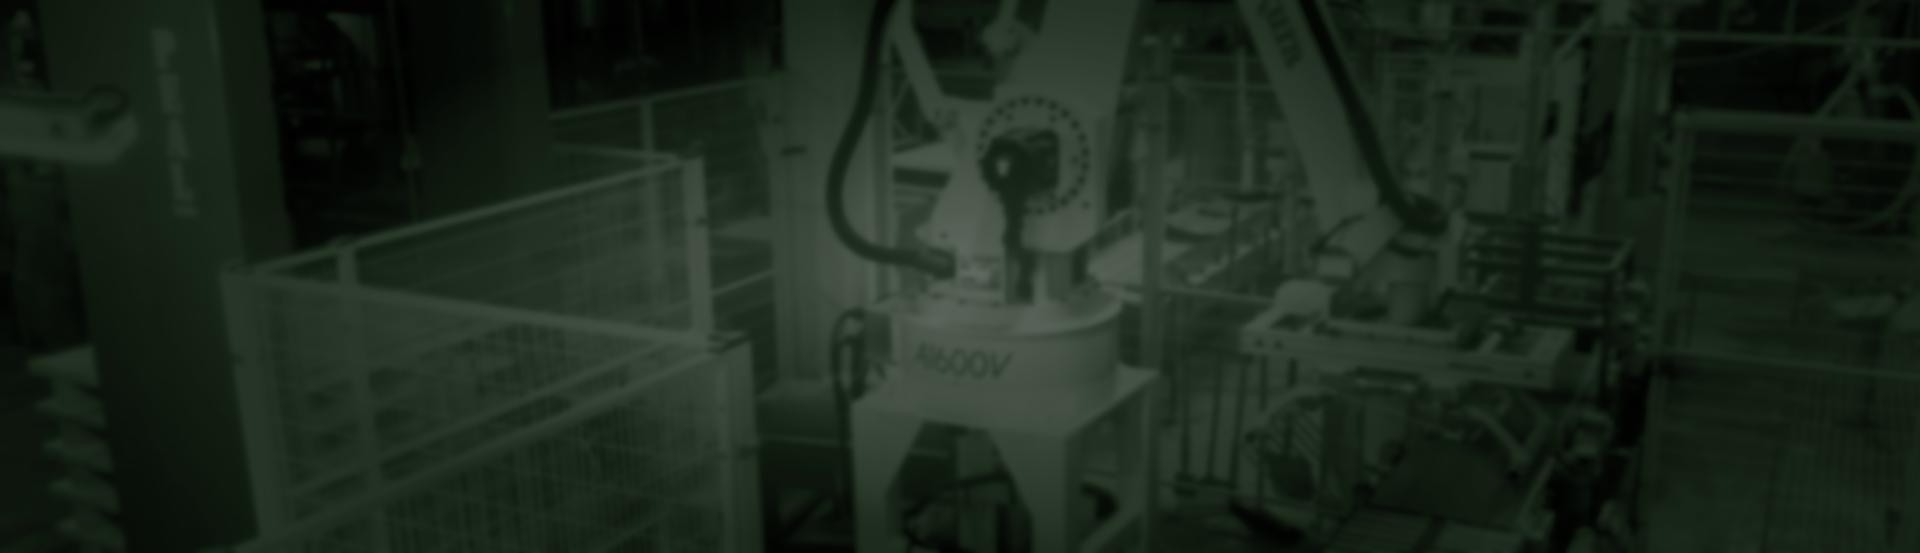 peal toppbanner - robotpalletering